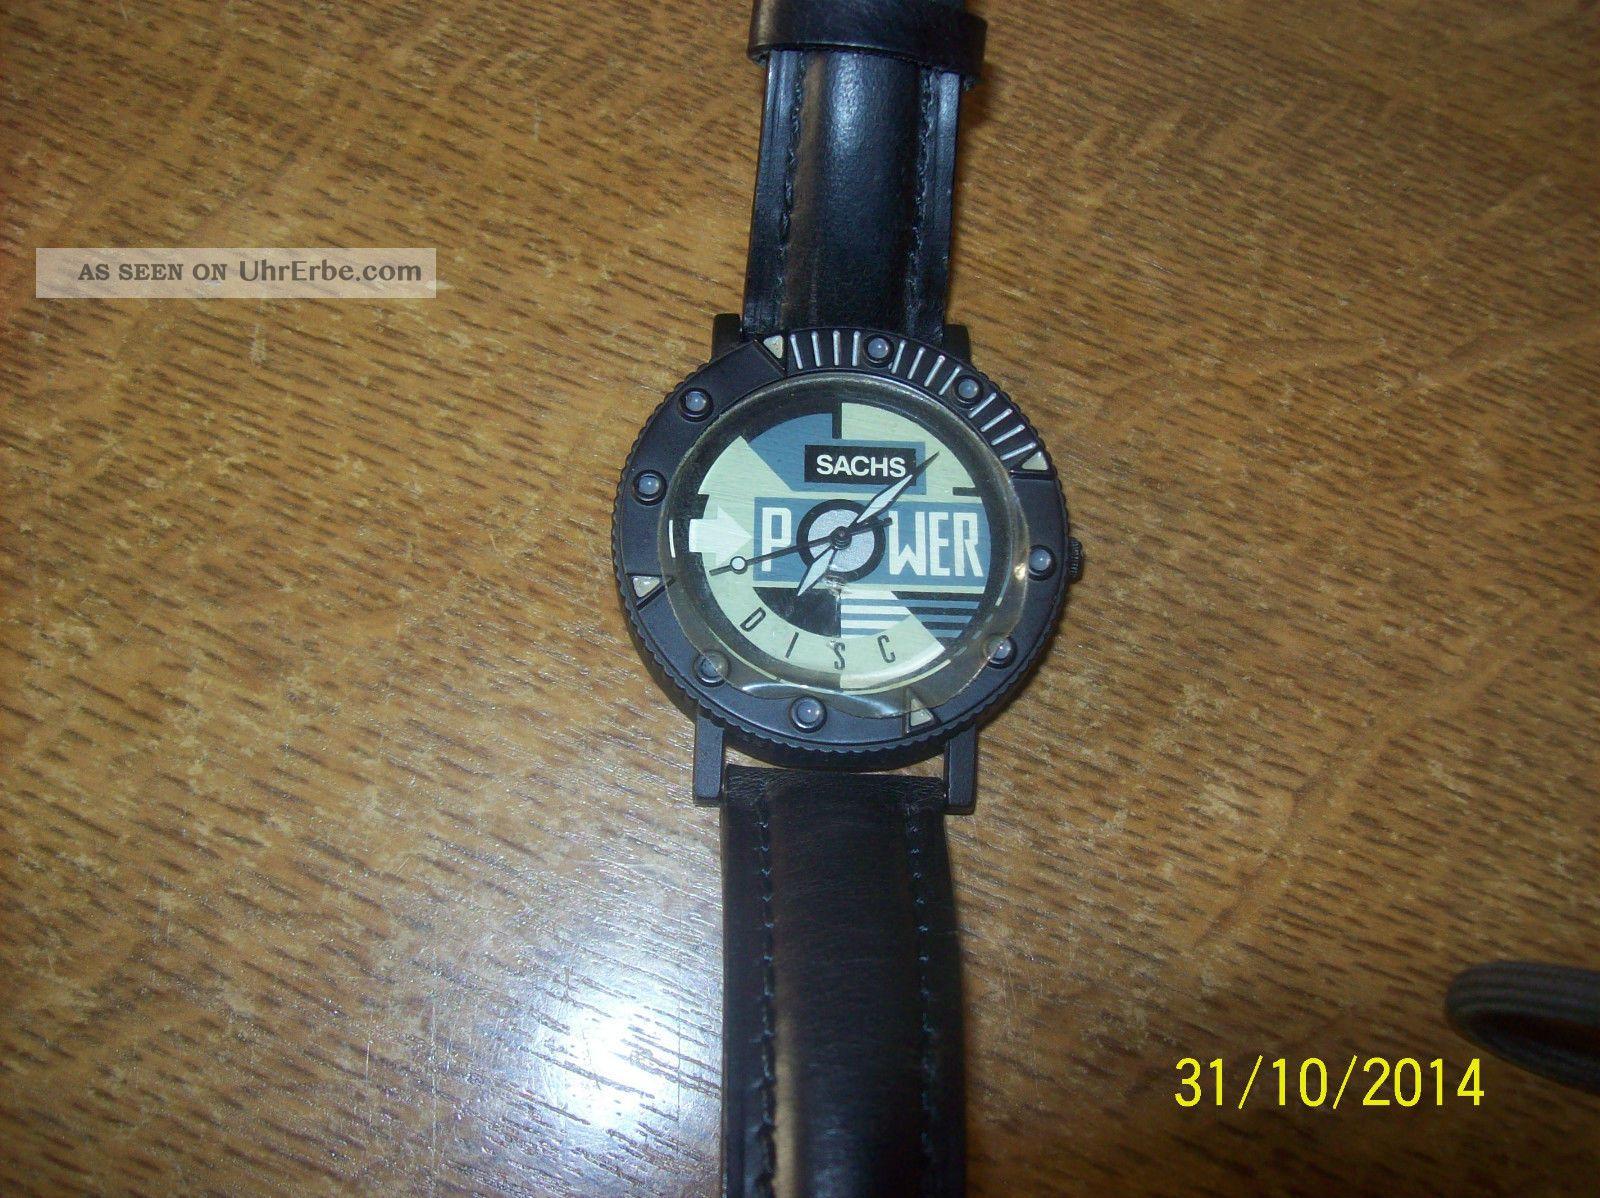 Werbearmbanduhr Sachs Power Selten Armbanduhren Bild